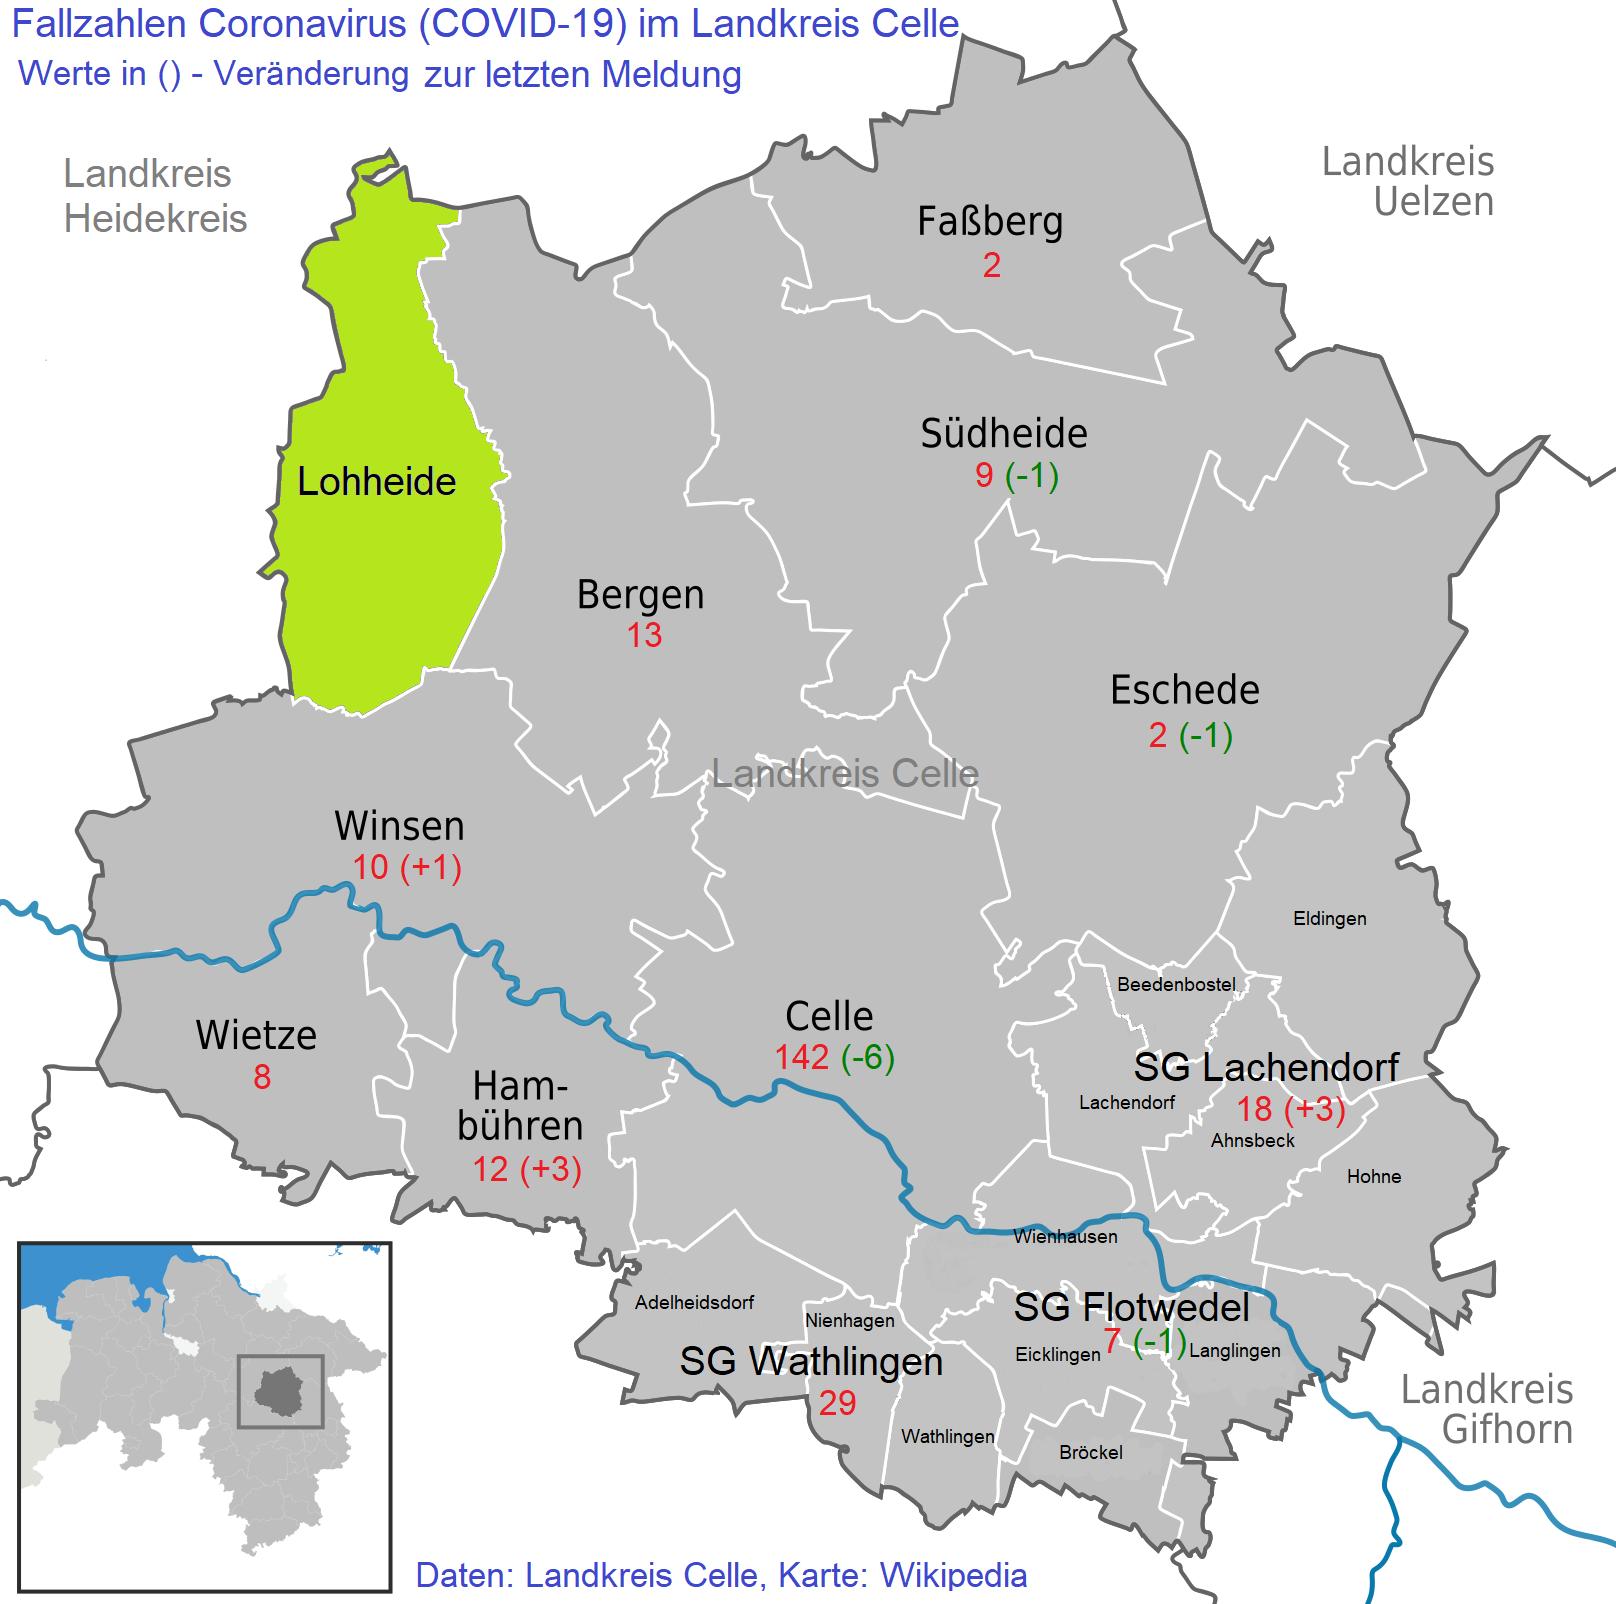 karte_lk_celle_wikipedia_25112020